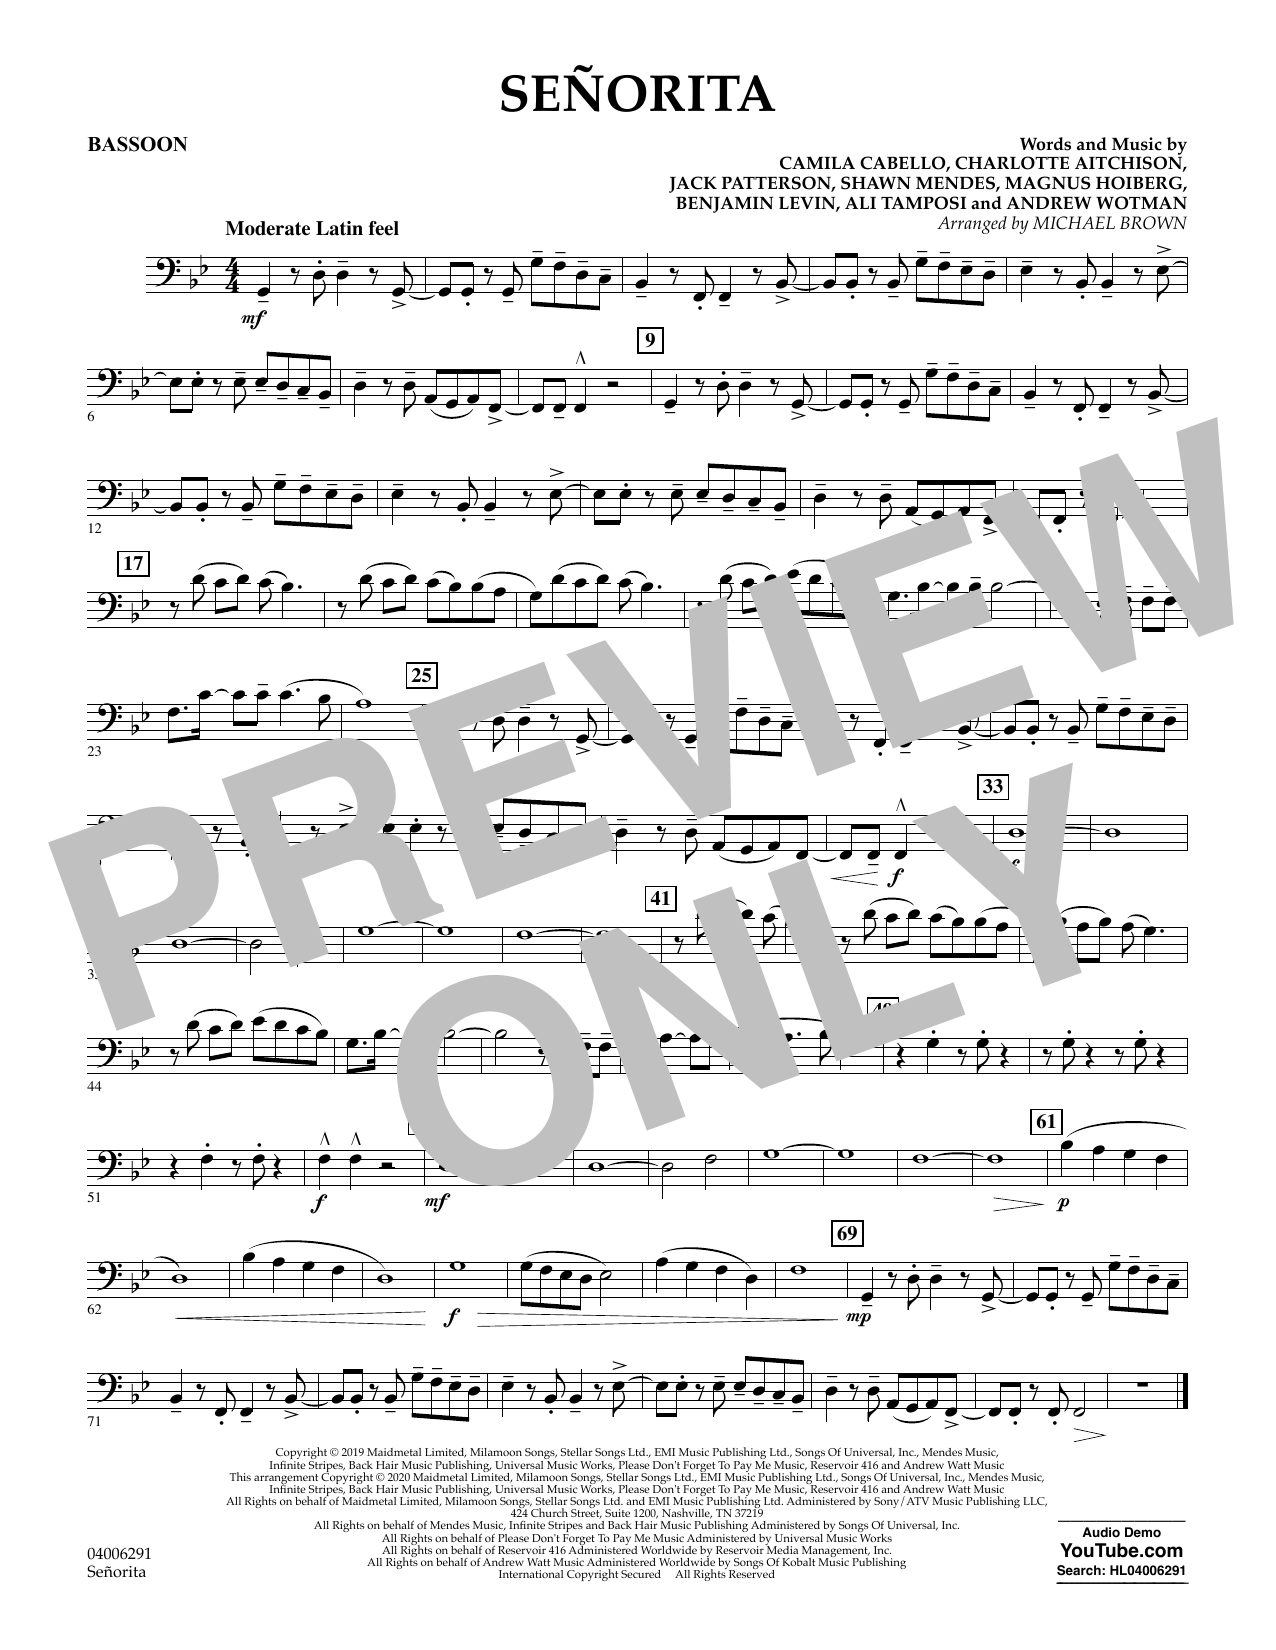 Señorita (arr. Michael Brown) - Bassoon (Concert Band)